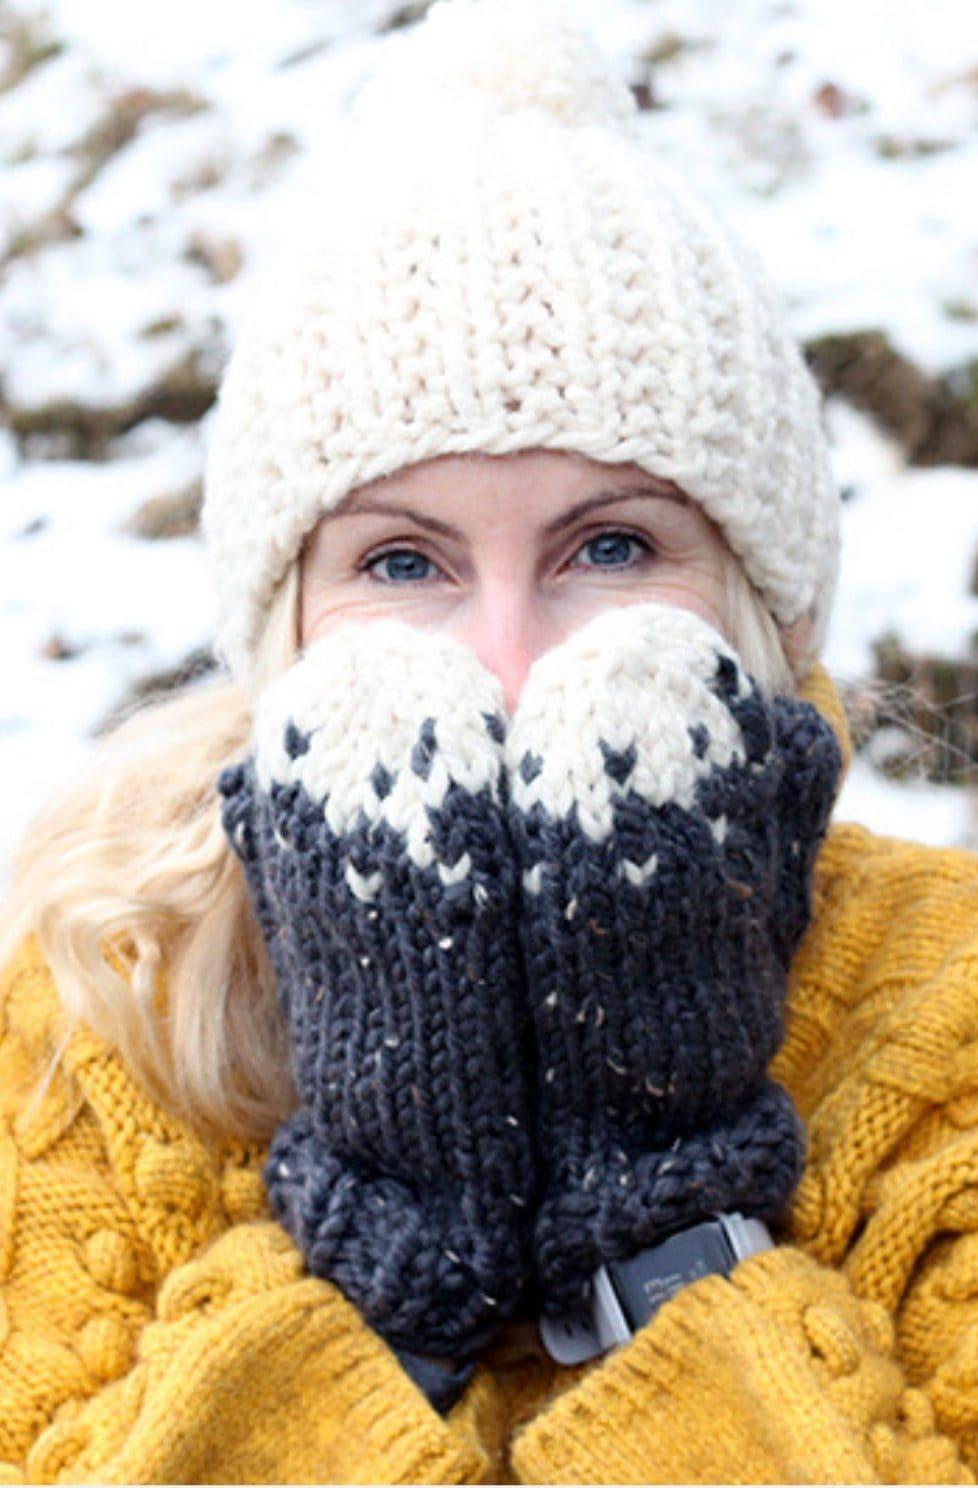 Snowy mountain mittens